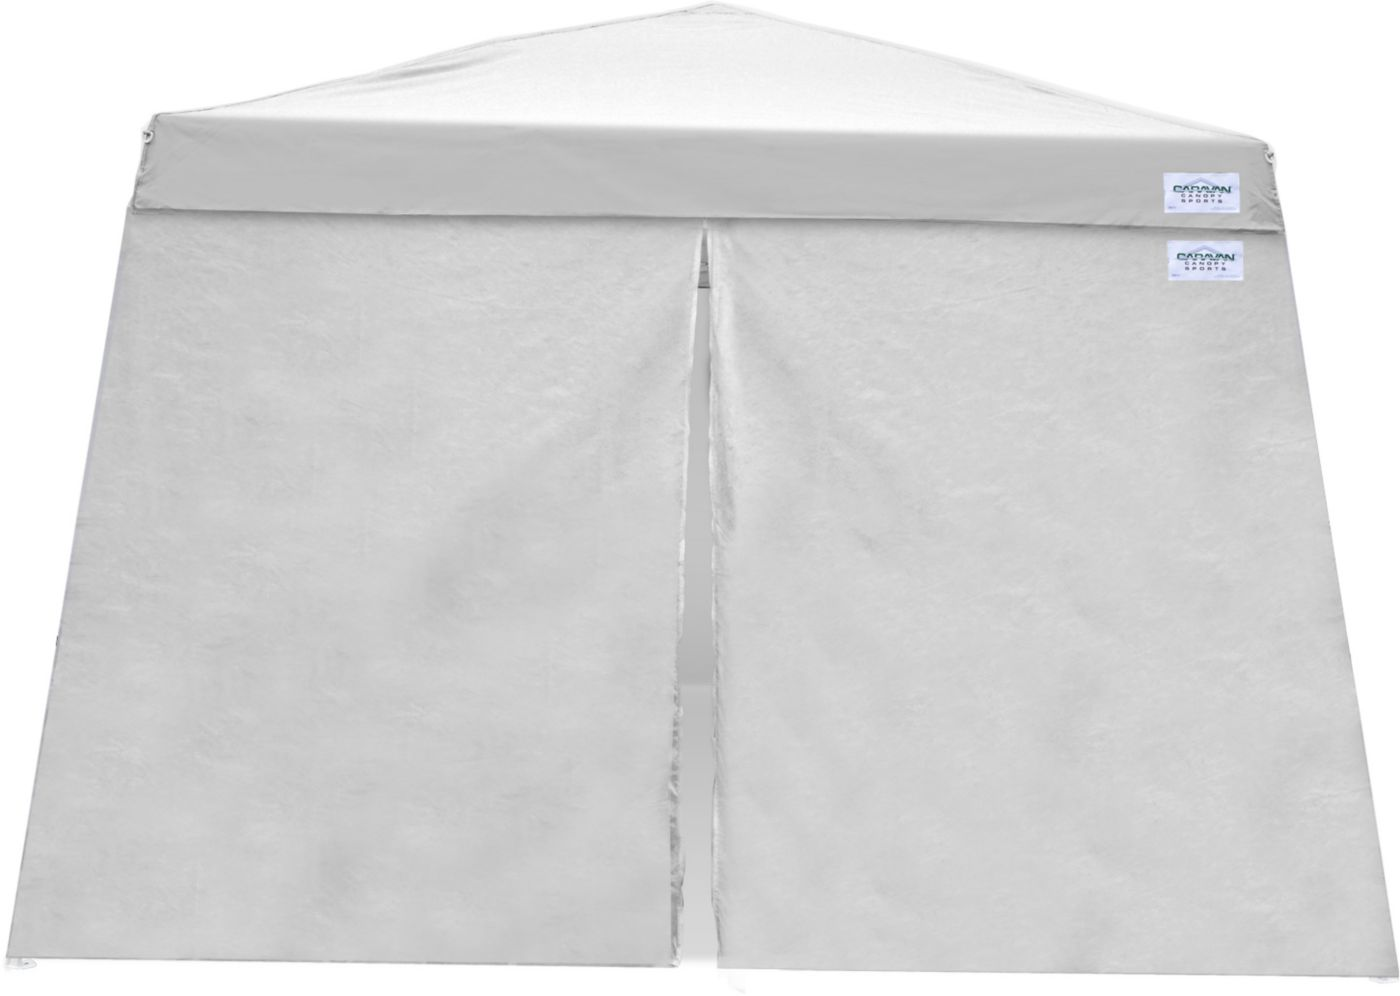 Caravan Canopy 12' x 12' V-Series Canopy Sidewalls